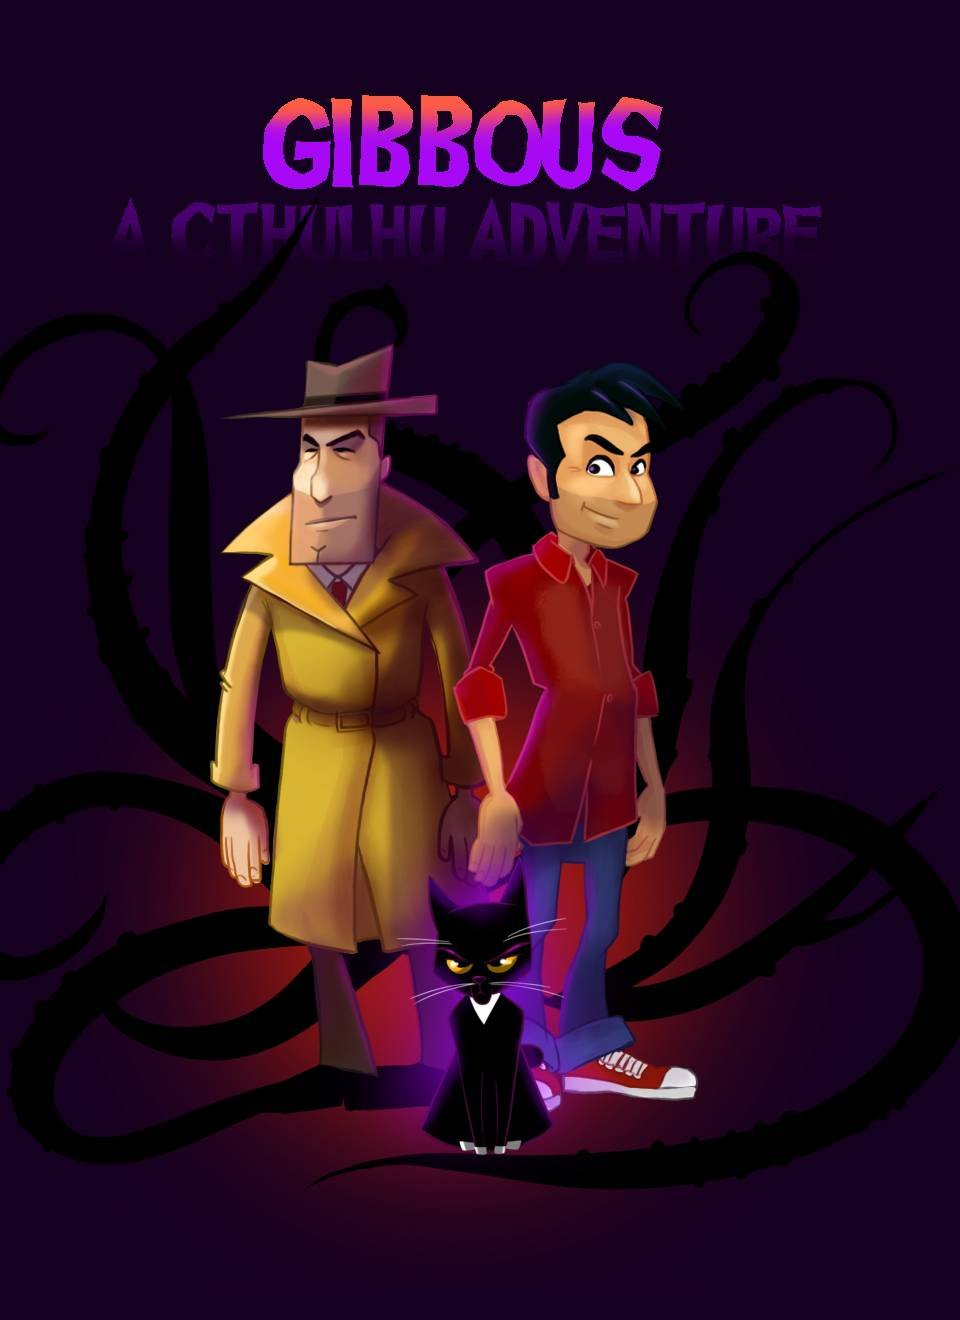 Gibbous - A Cthulhu Adventure v.1.8 [GOG] (2019)